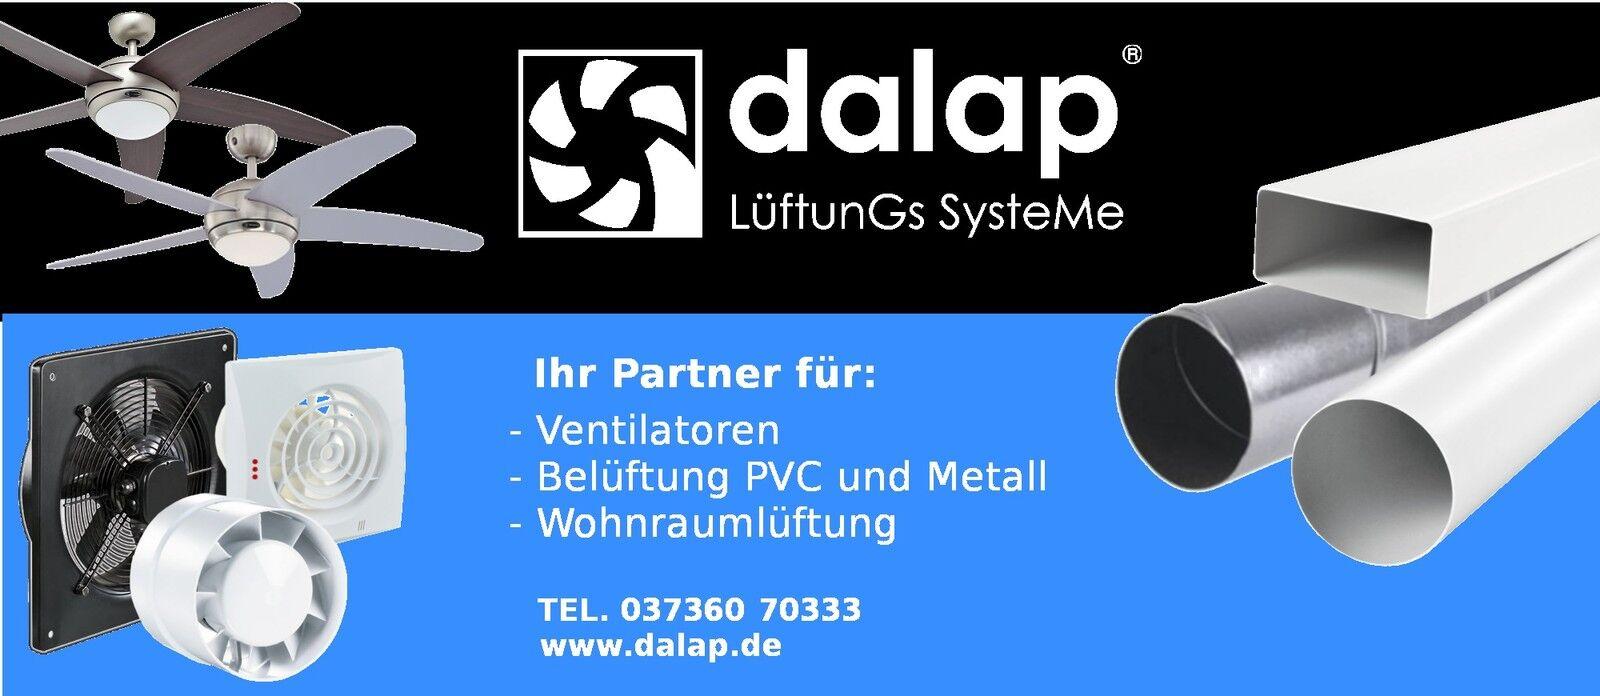 Dalap GmbH